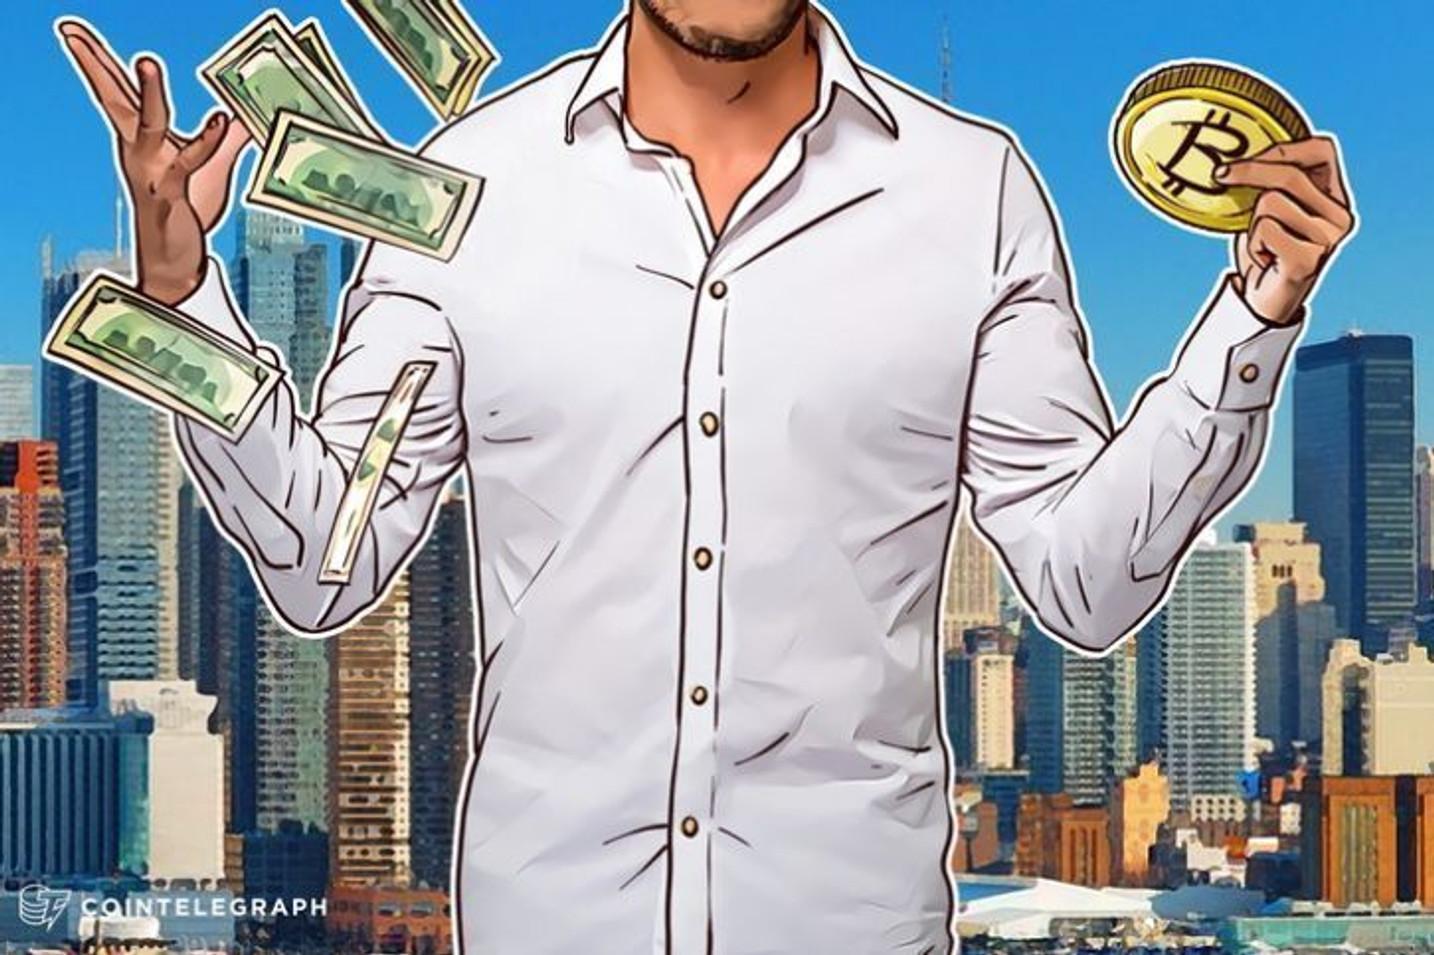 Goldman Sachs Will Start Bank Money 'Stampede' Into Bitcoin: Ritholtz CEO